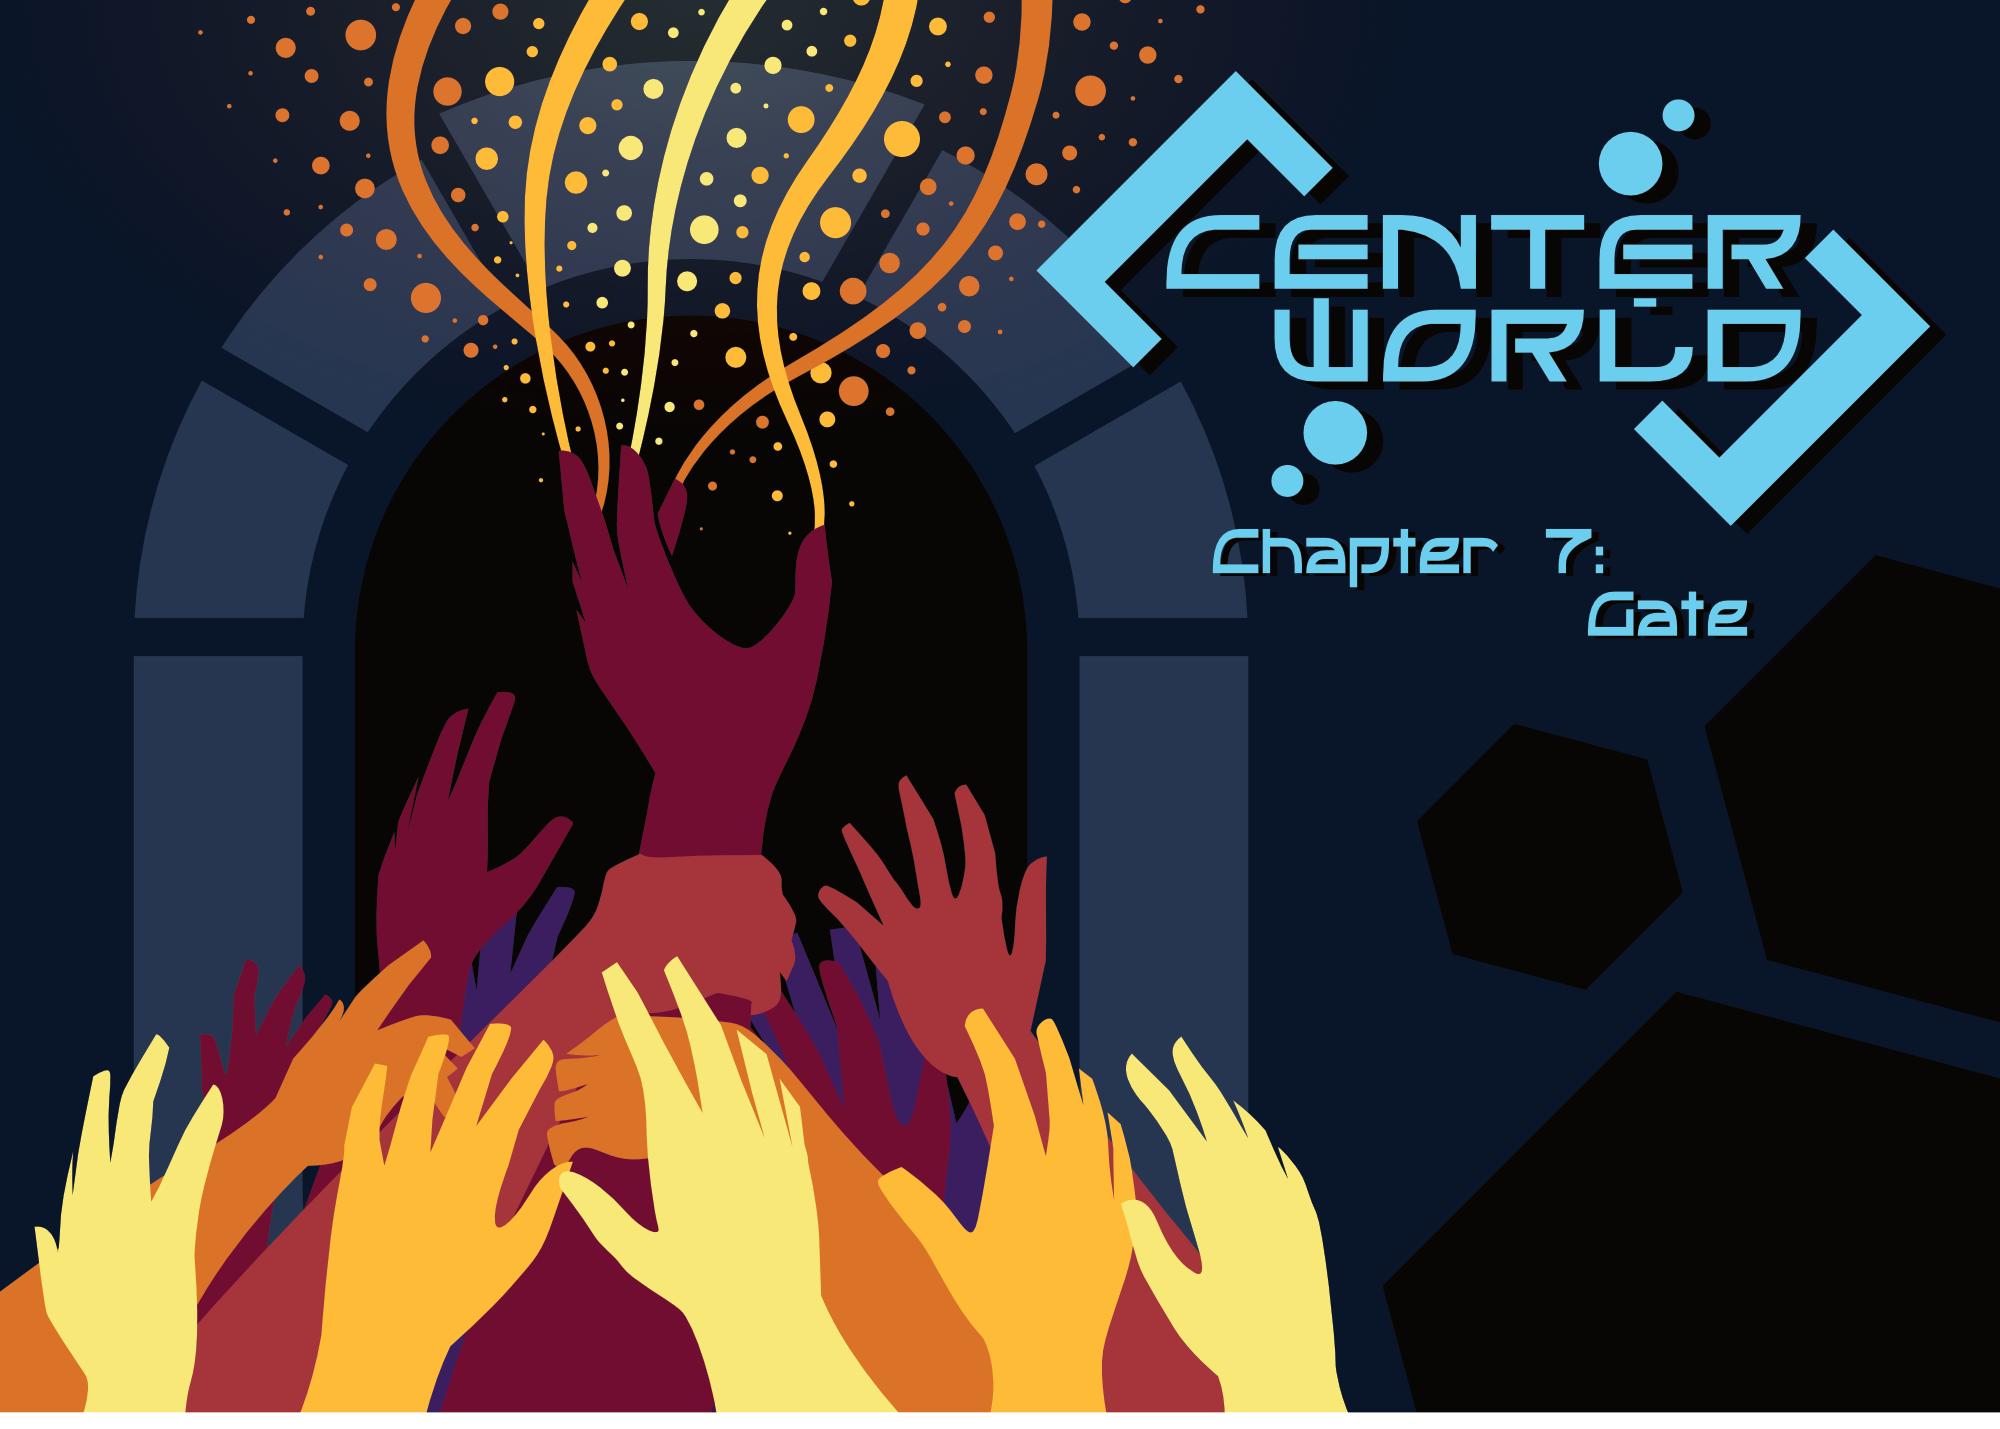 Center World 7.0